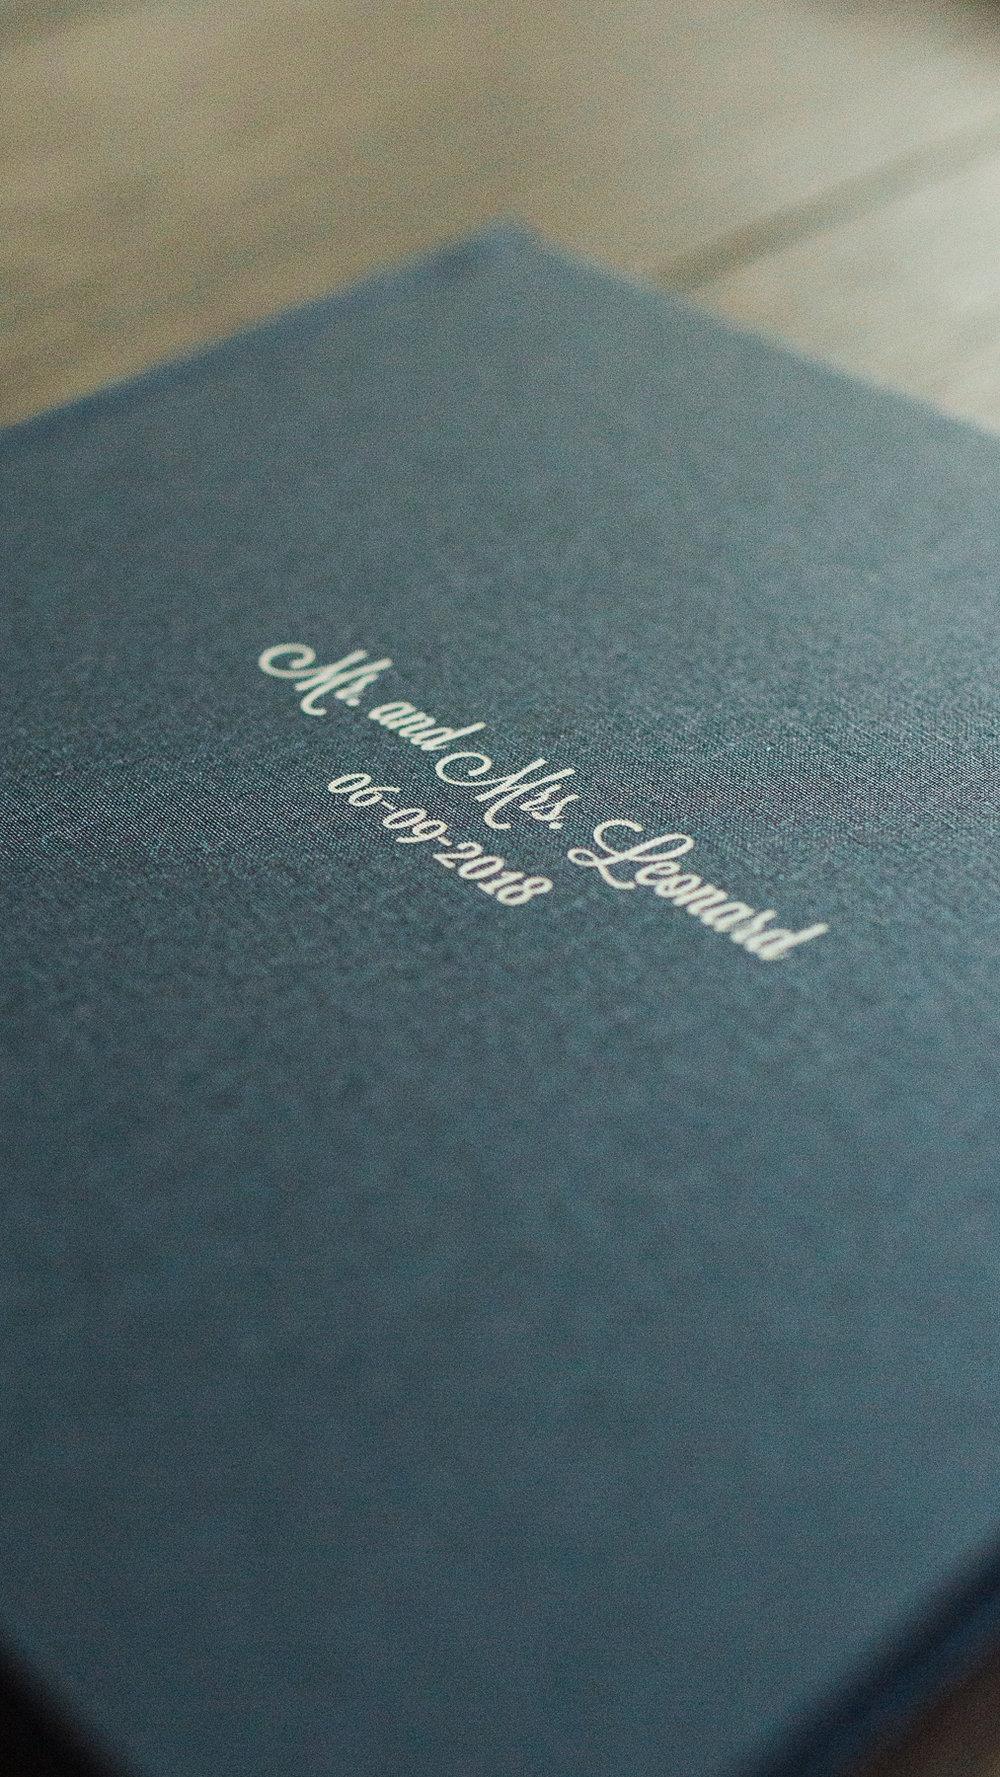 Album sample photos-1.jpg